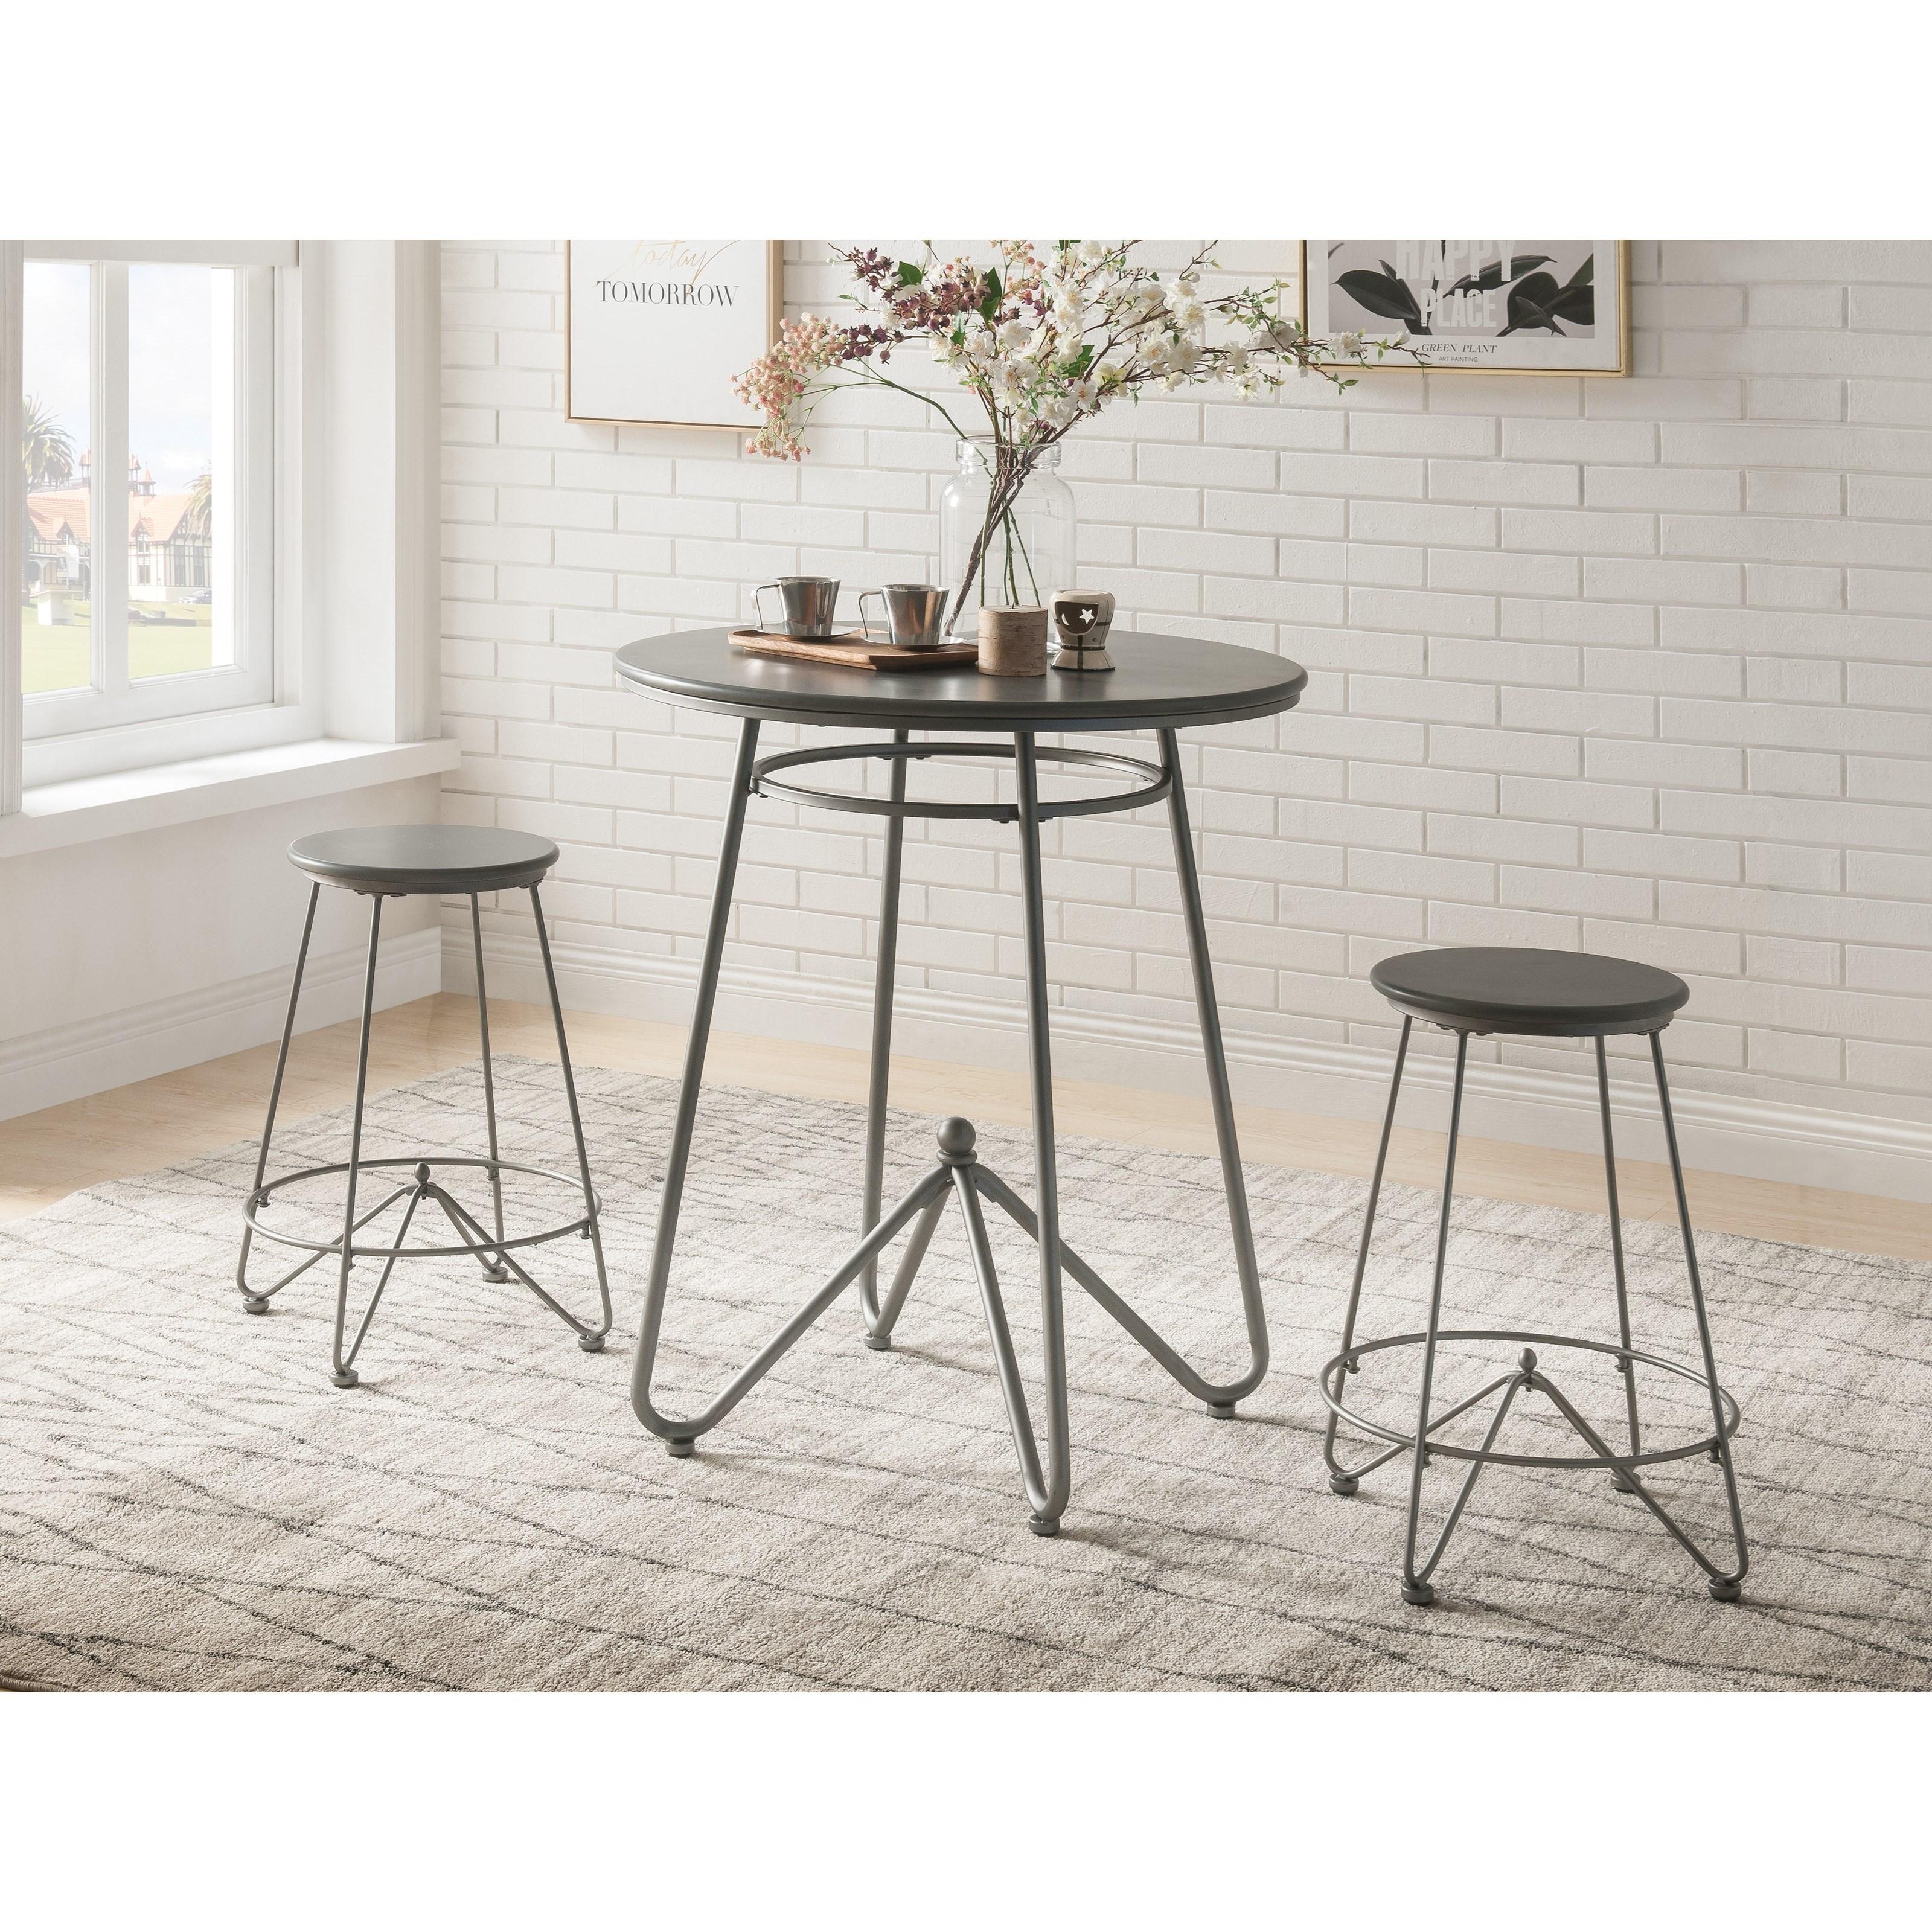 Nimai 3-Piece Counter Height Set by Acme Furniture at Carolina Direct